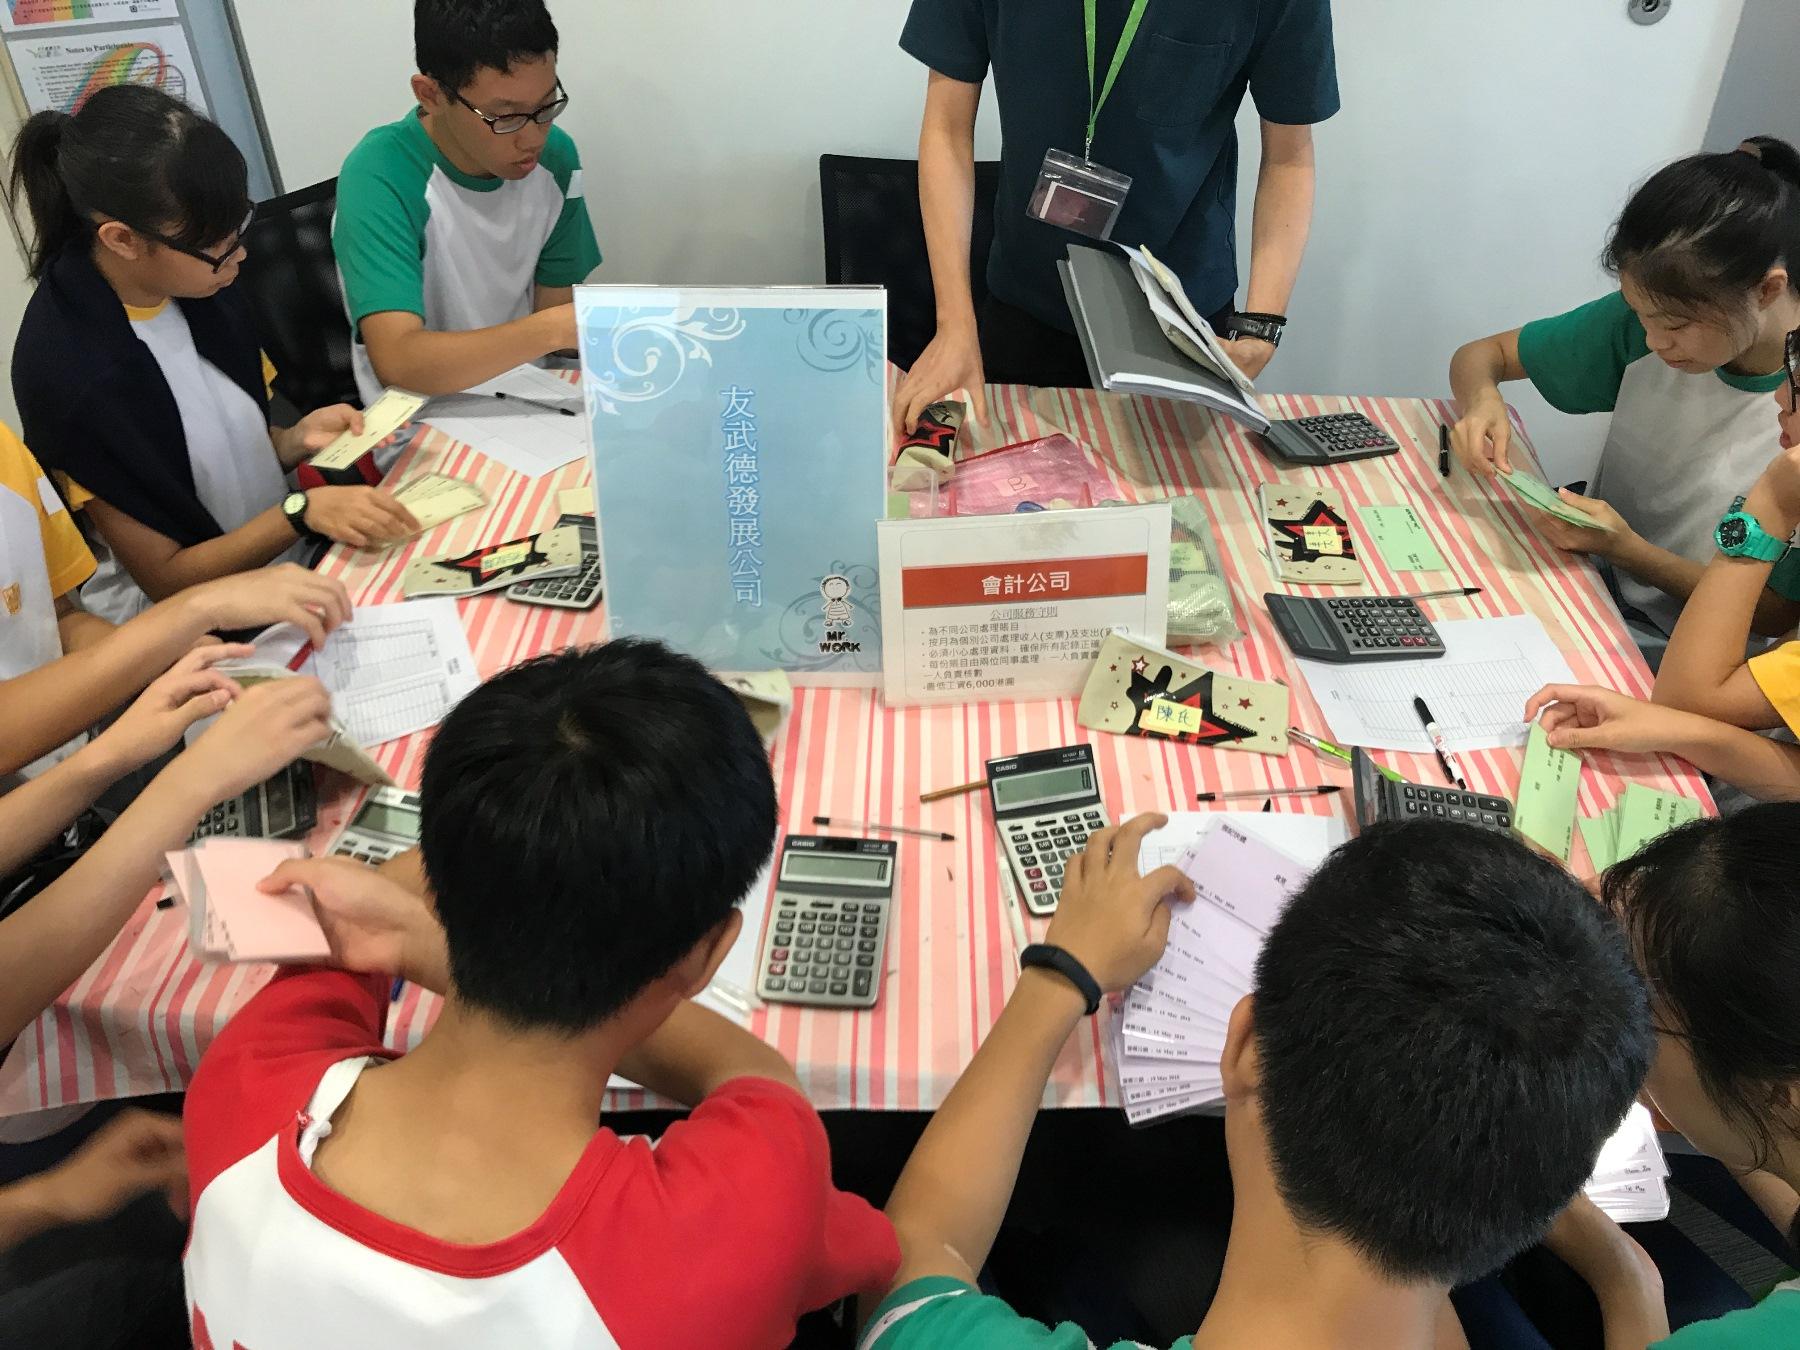 http://www.npc.edu.hk/sites/default/files/img_4061.jpg